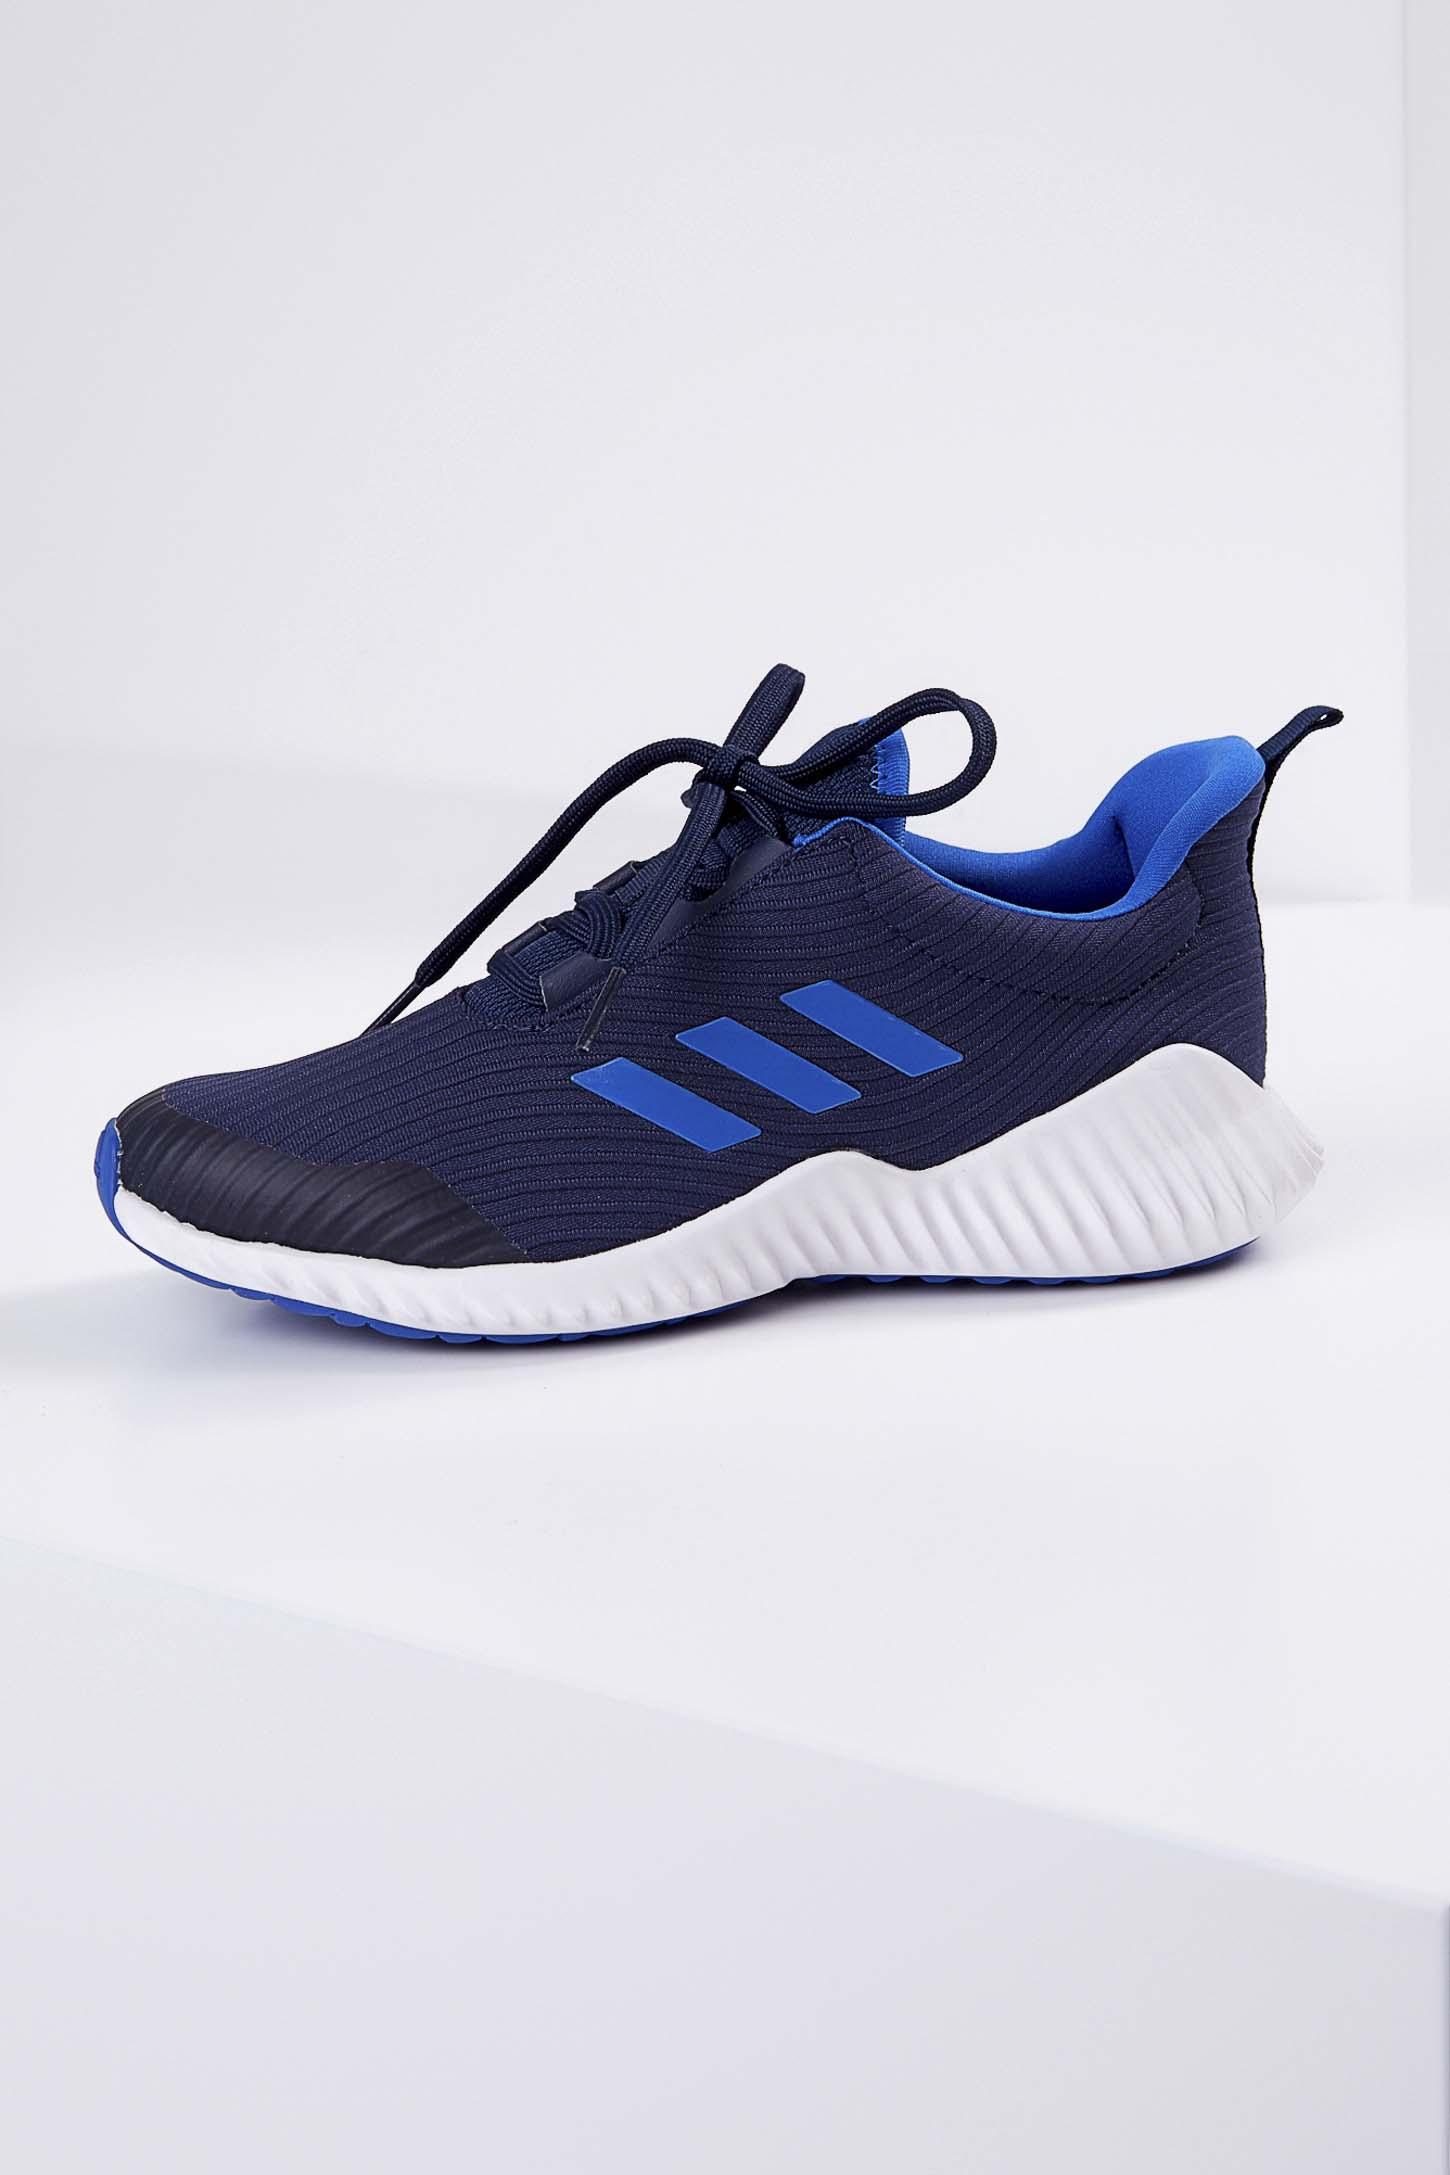 Tenis-Adidas-Fortarun-Infantil-Ah2620-Marinho-